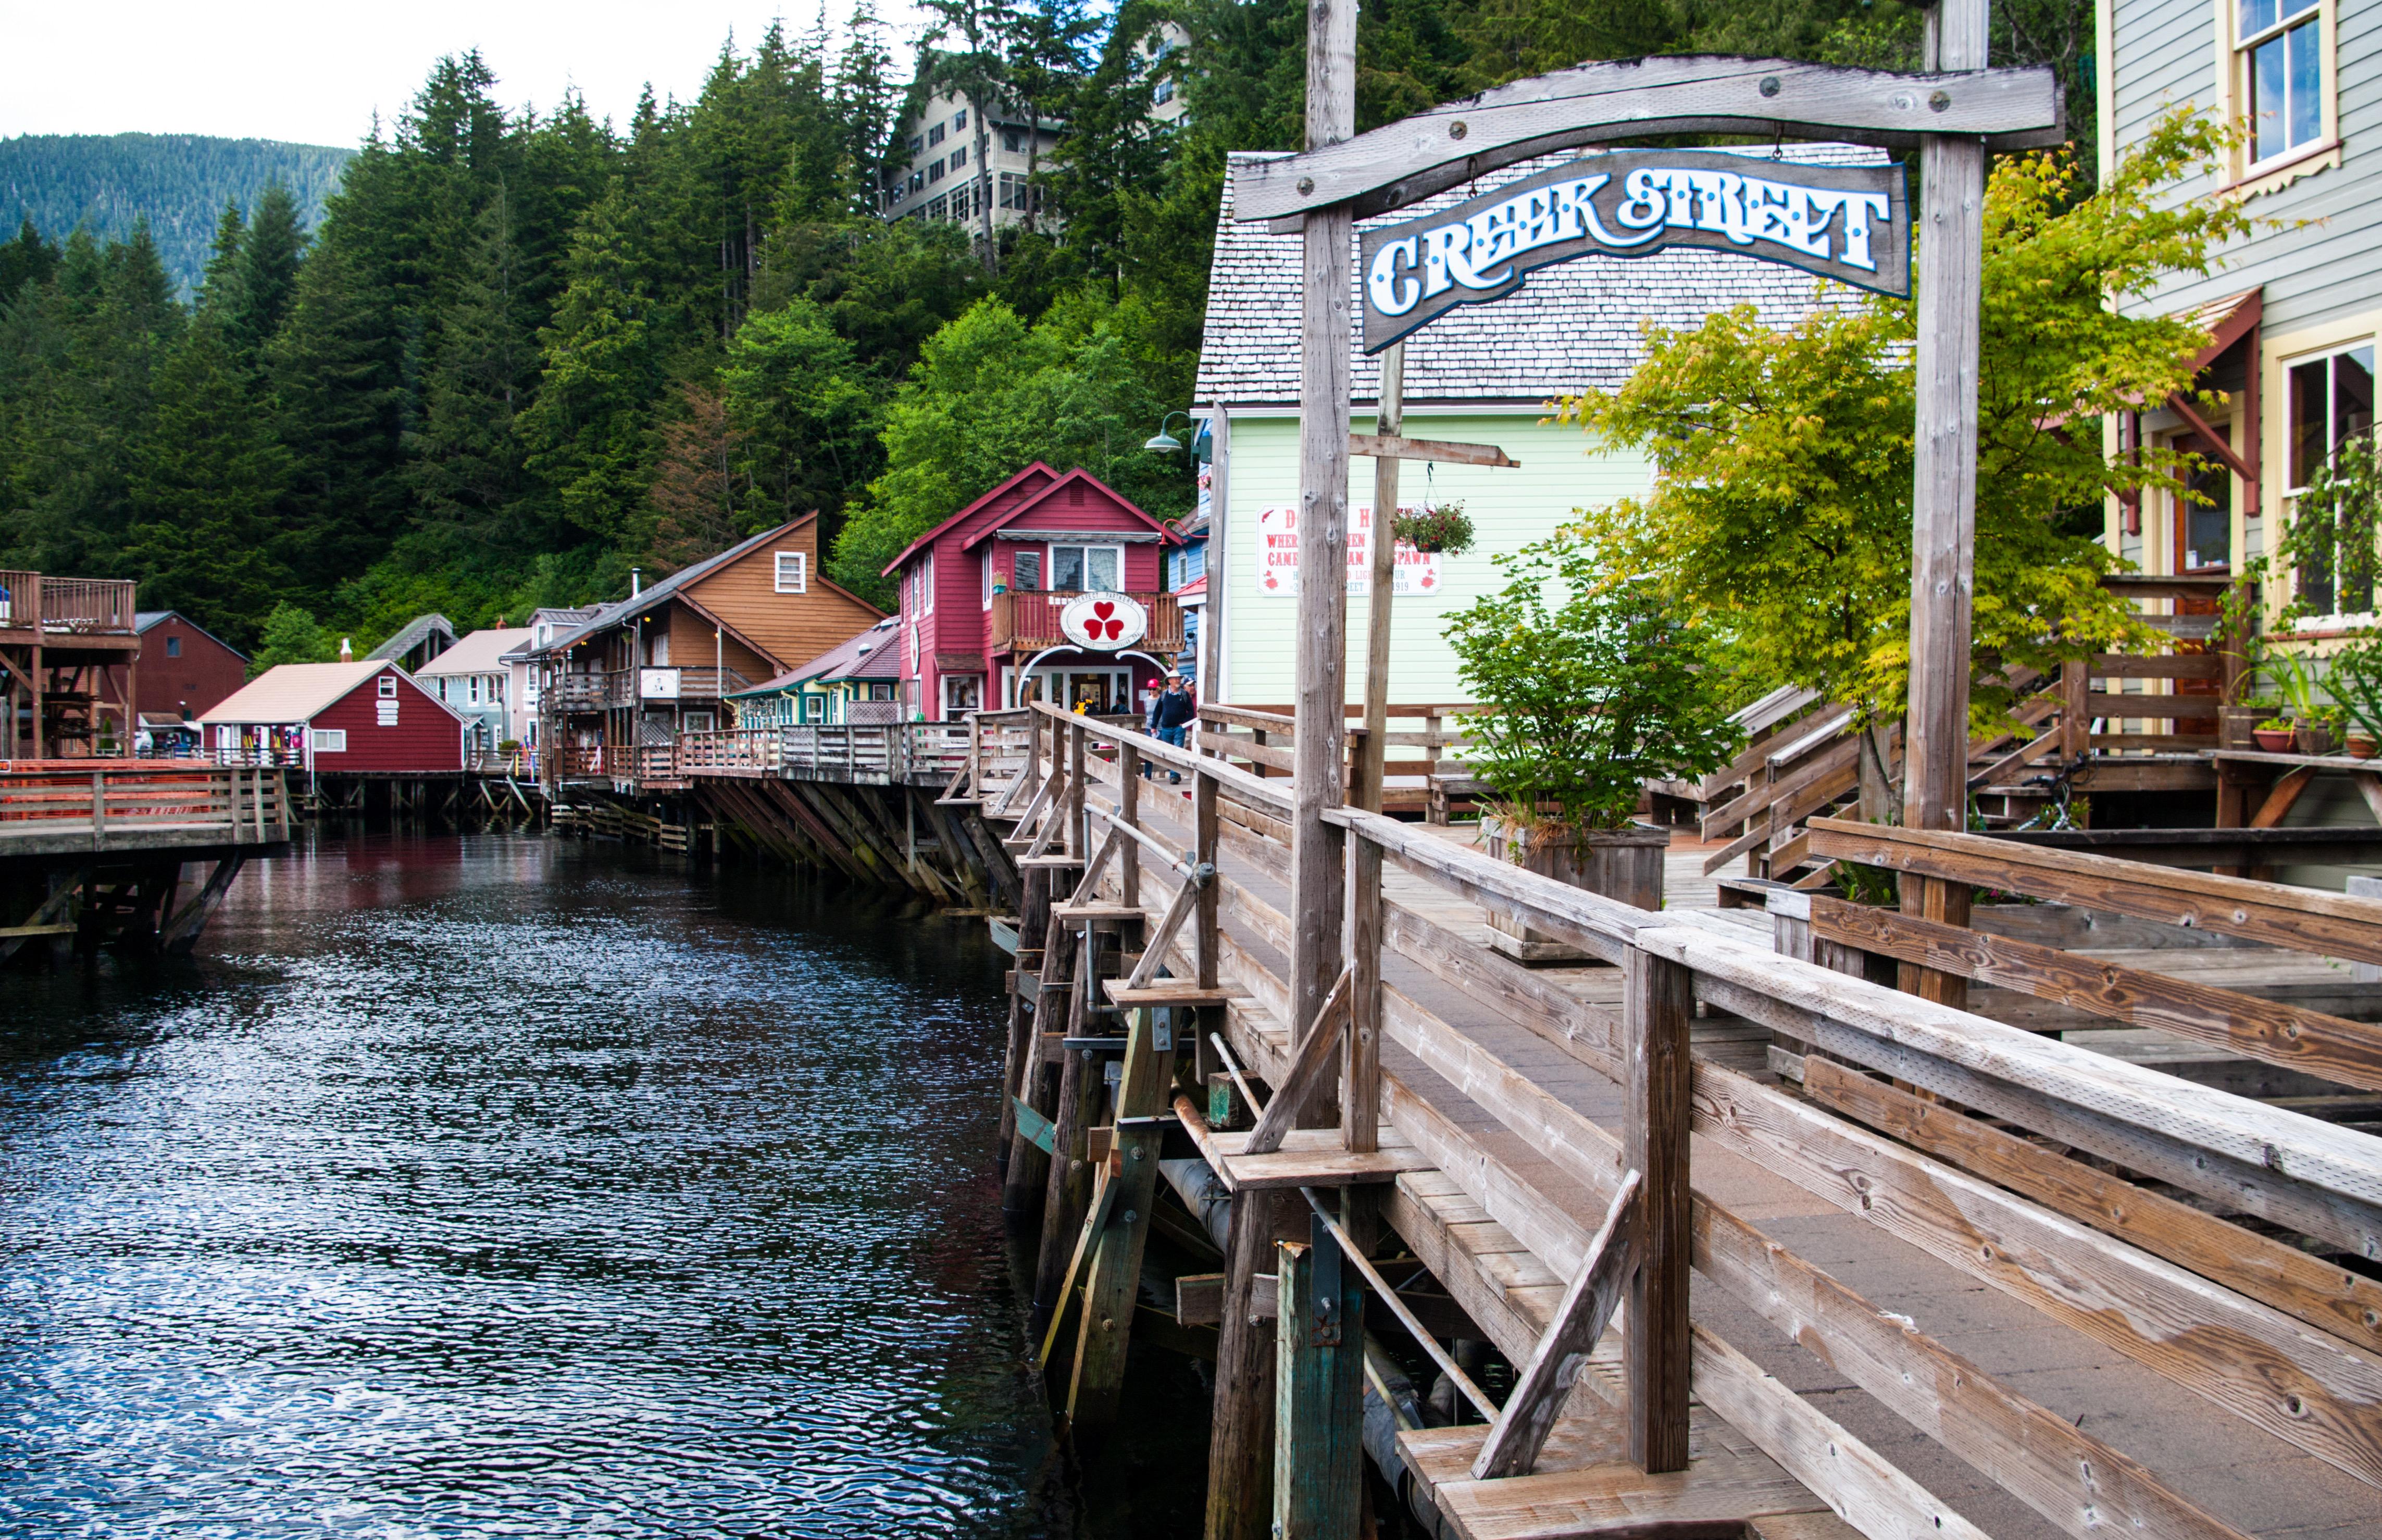 Creek Street looking north in Ketchikan Alaska